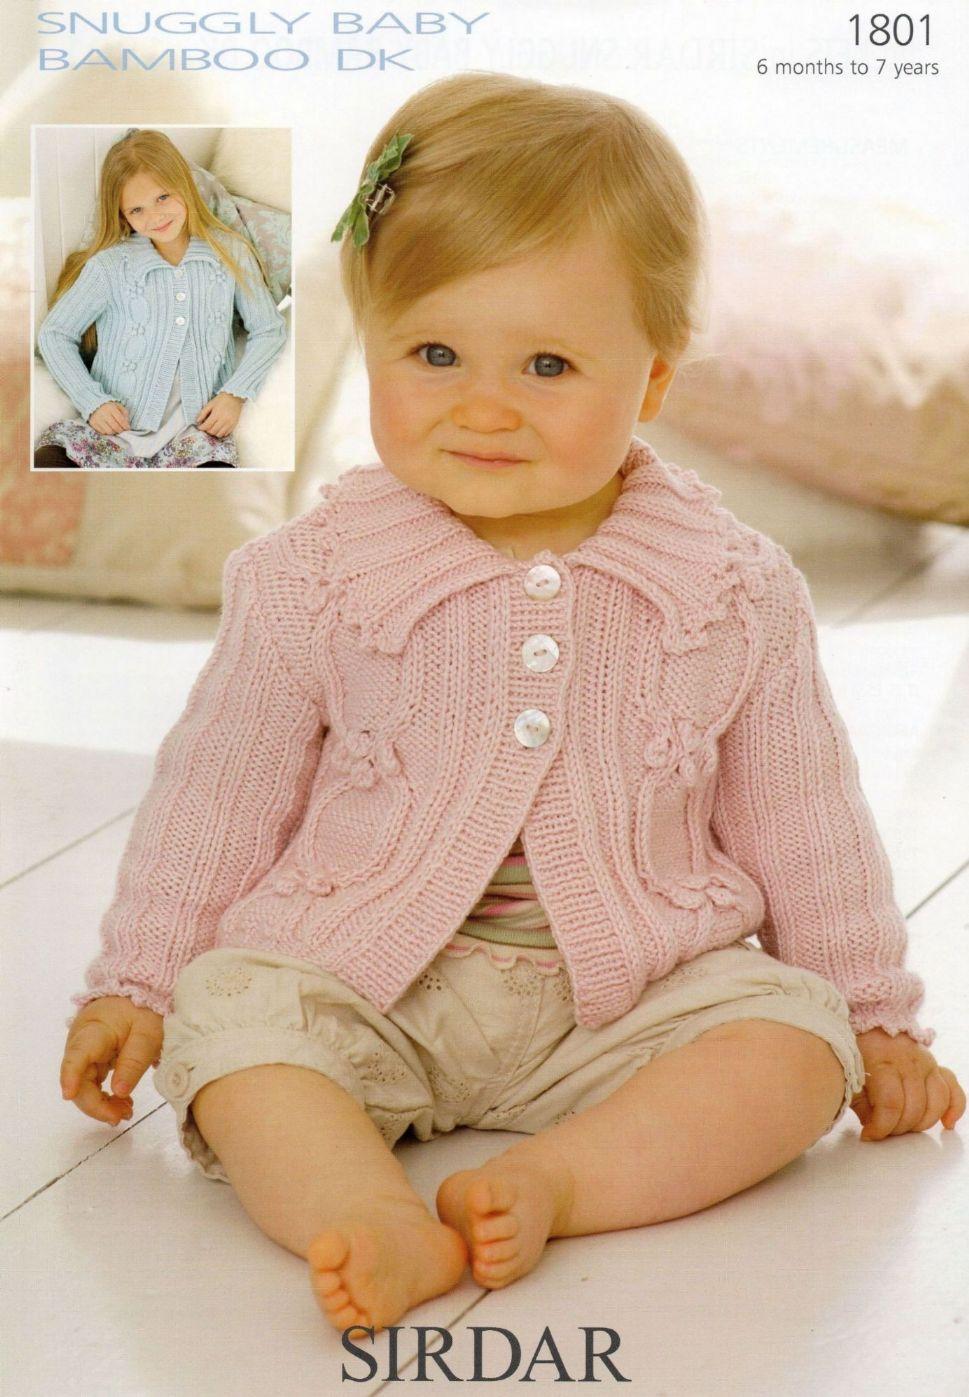 1801 Sirdar Snuggly Baby Bamboo Dk Cardigan Knitting